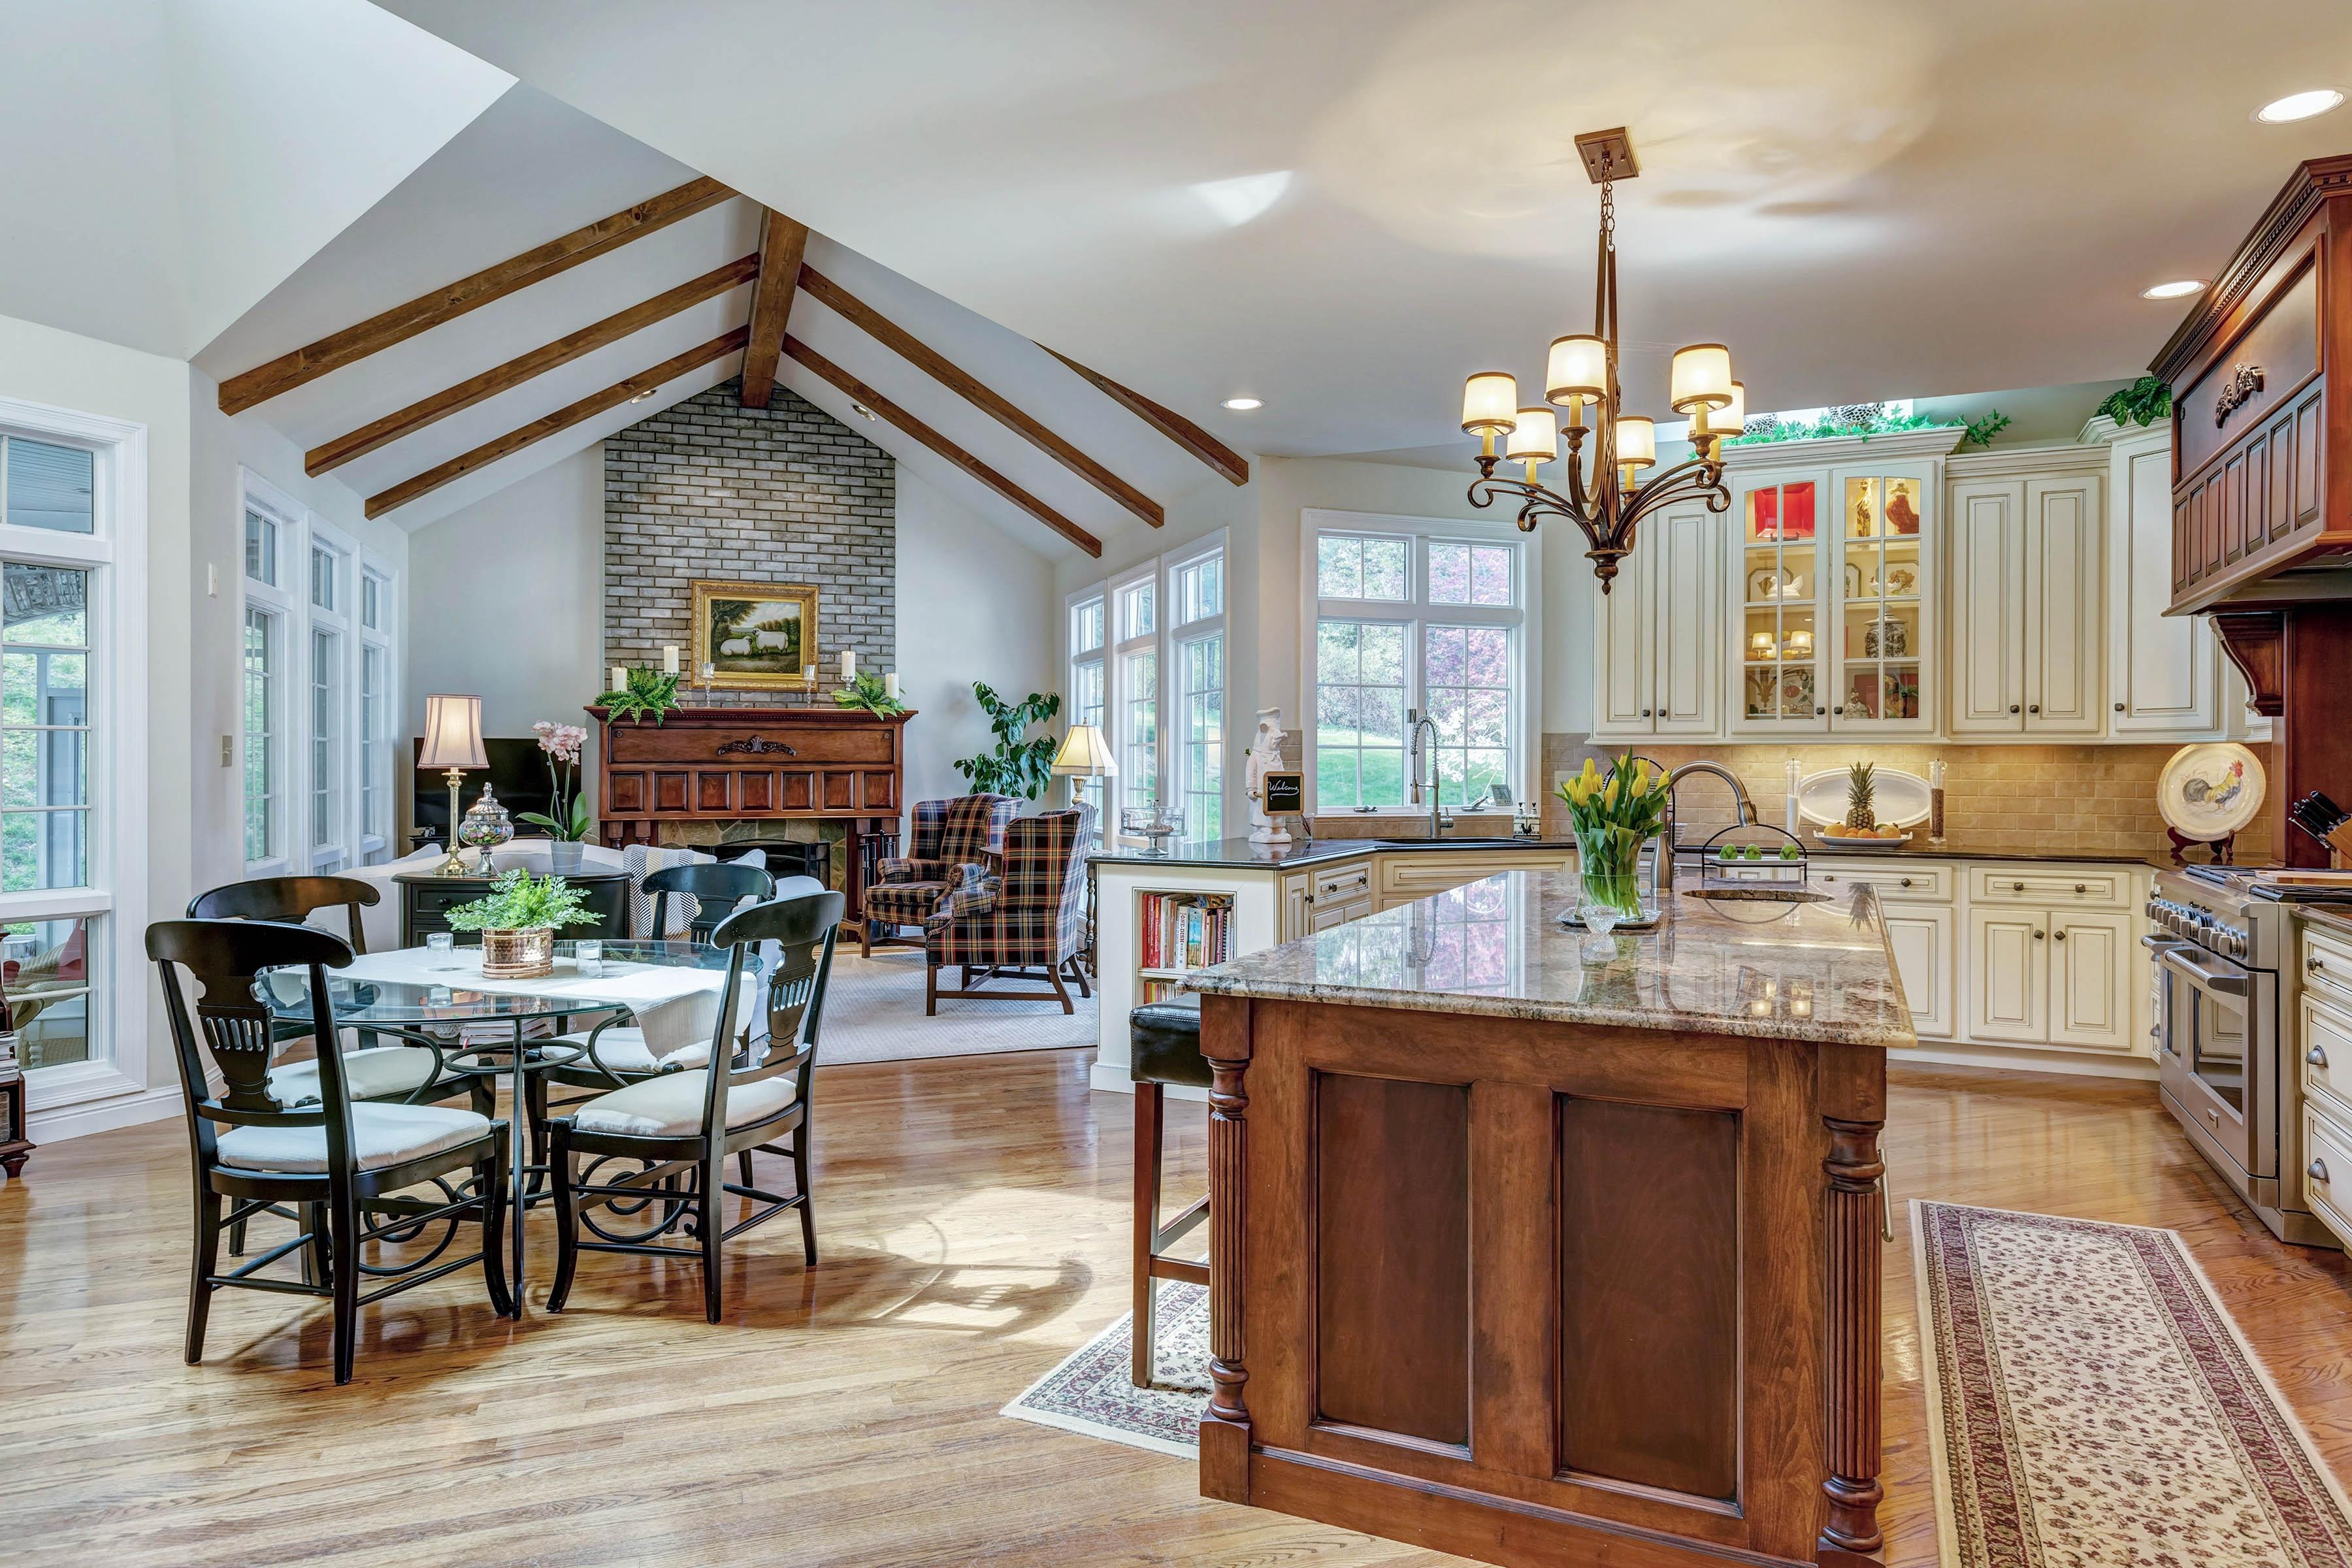 Kitchen & Hearth Room.